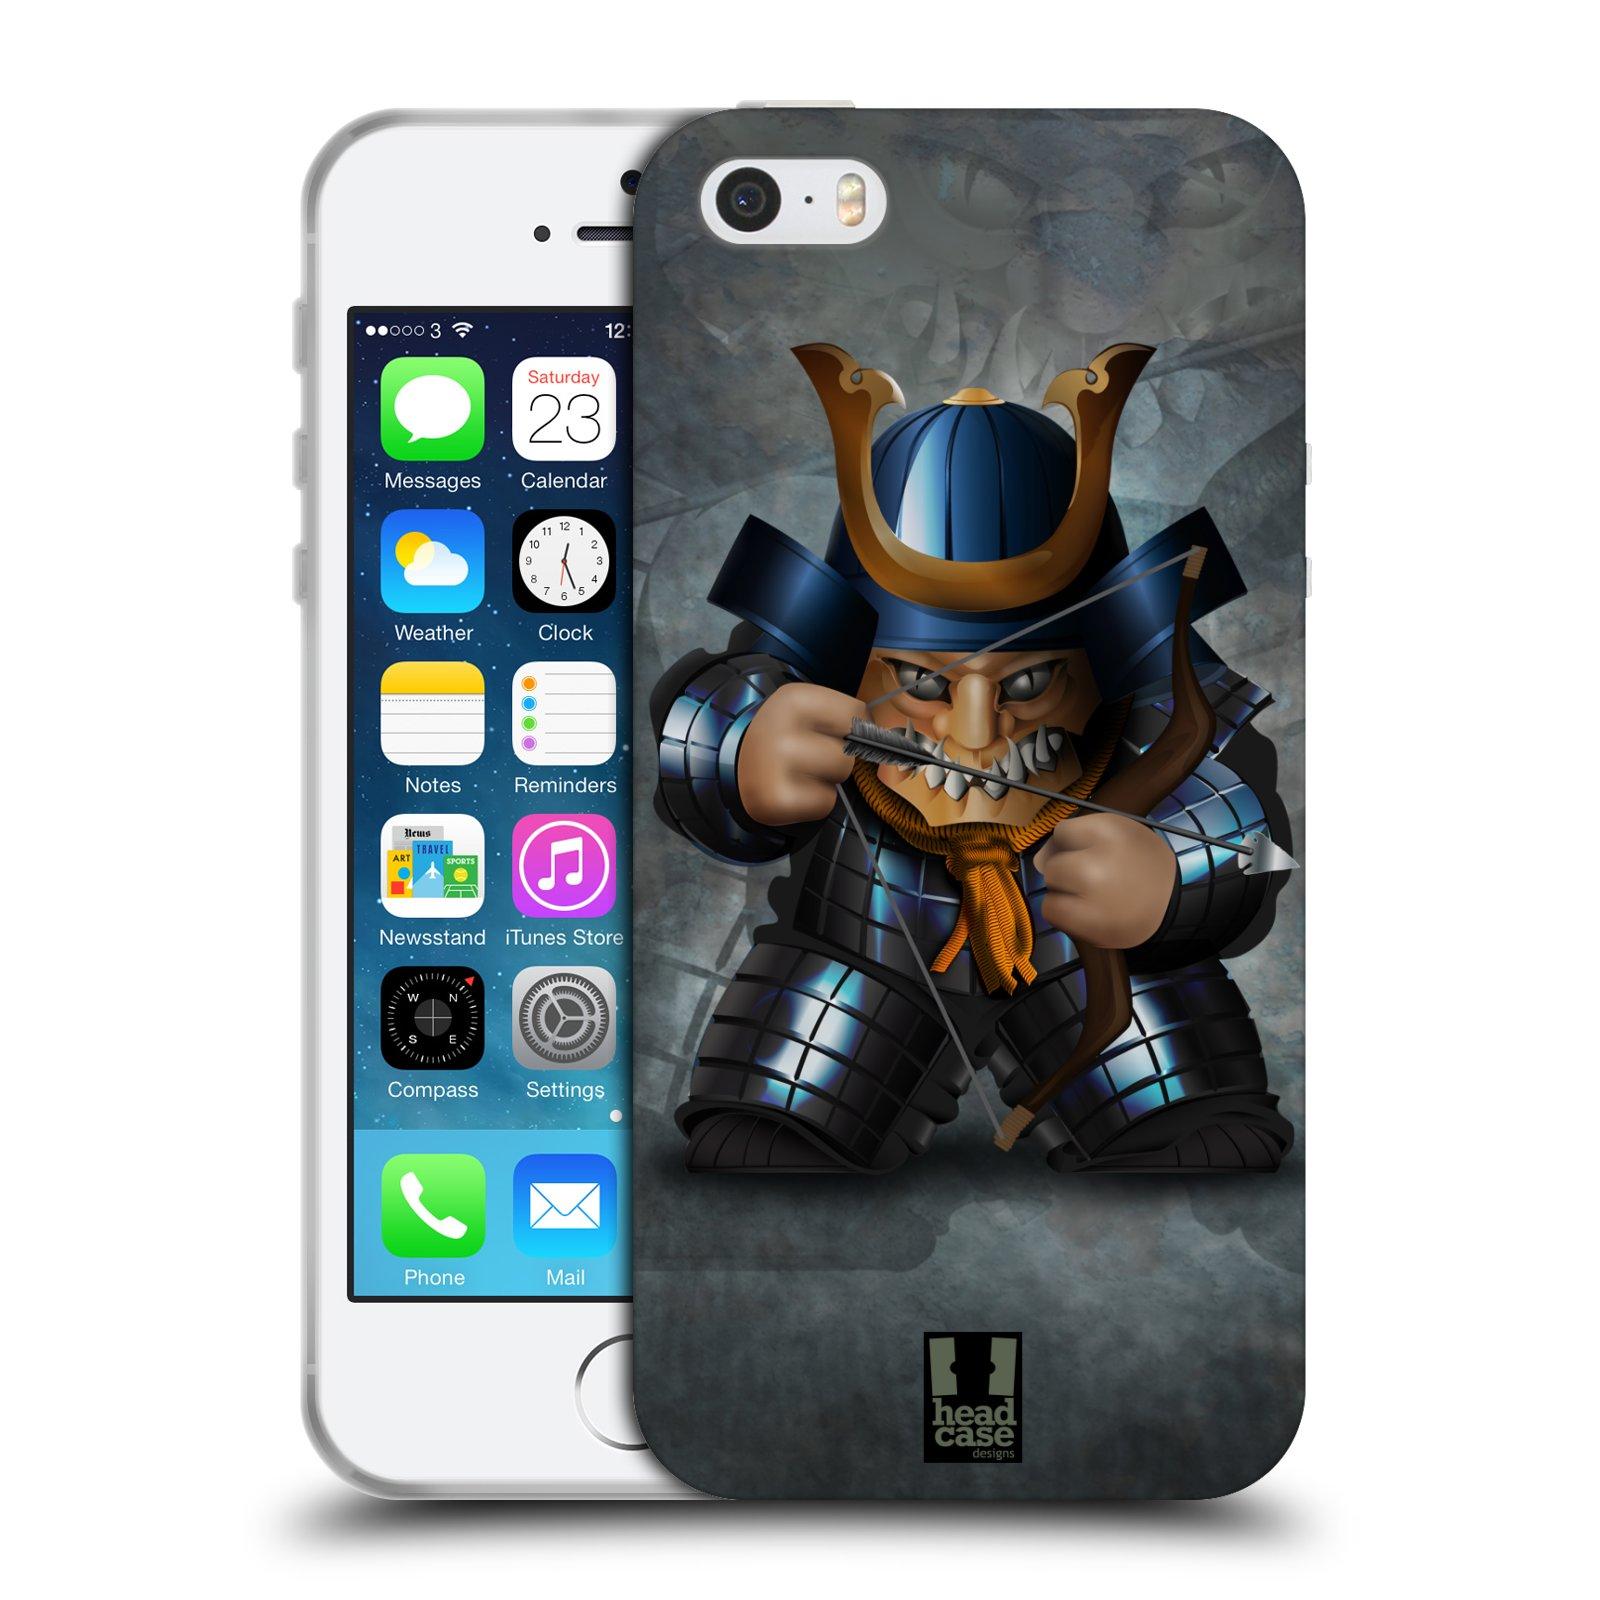 HEAD CASE silikonový obal na mobil Apple Iphone 5/5S vzor Malí bojovníci SHOGUN STŘELEC